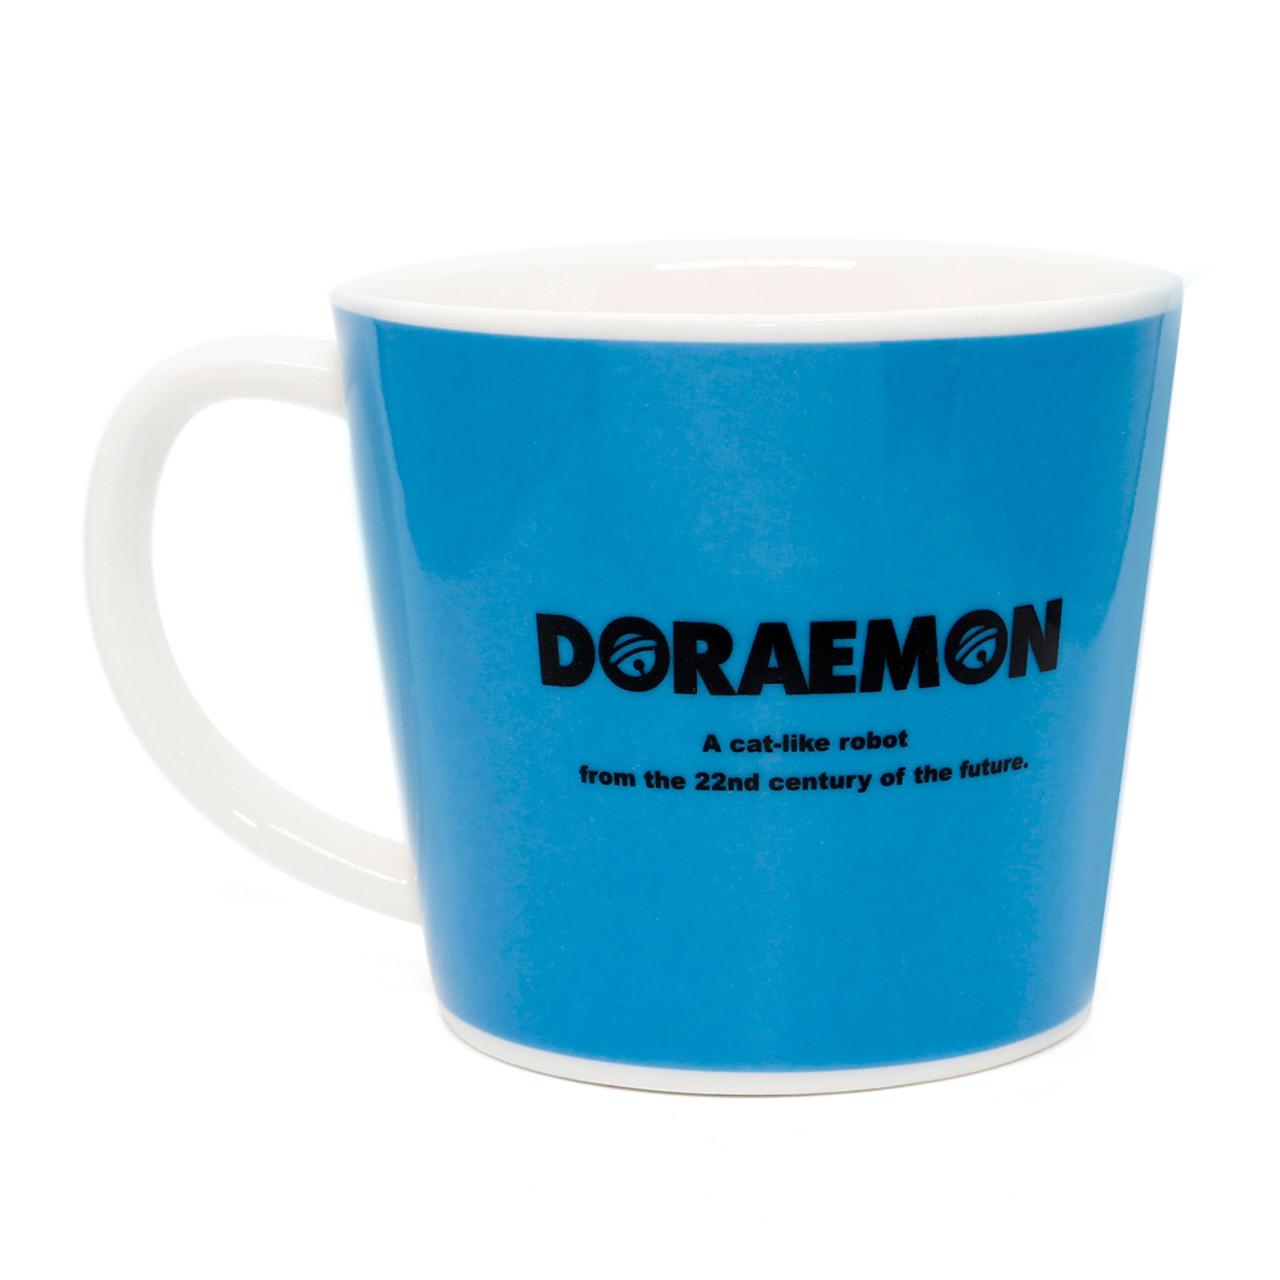 Japan Doraemon Face Porcelain Coffee Mug - Doraemon ( Back View )